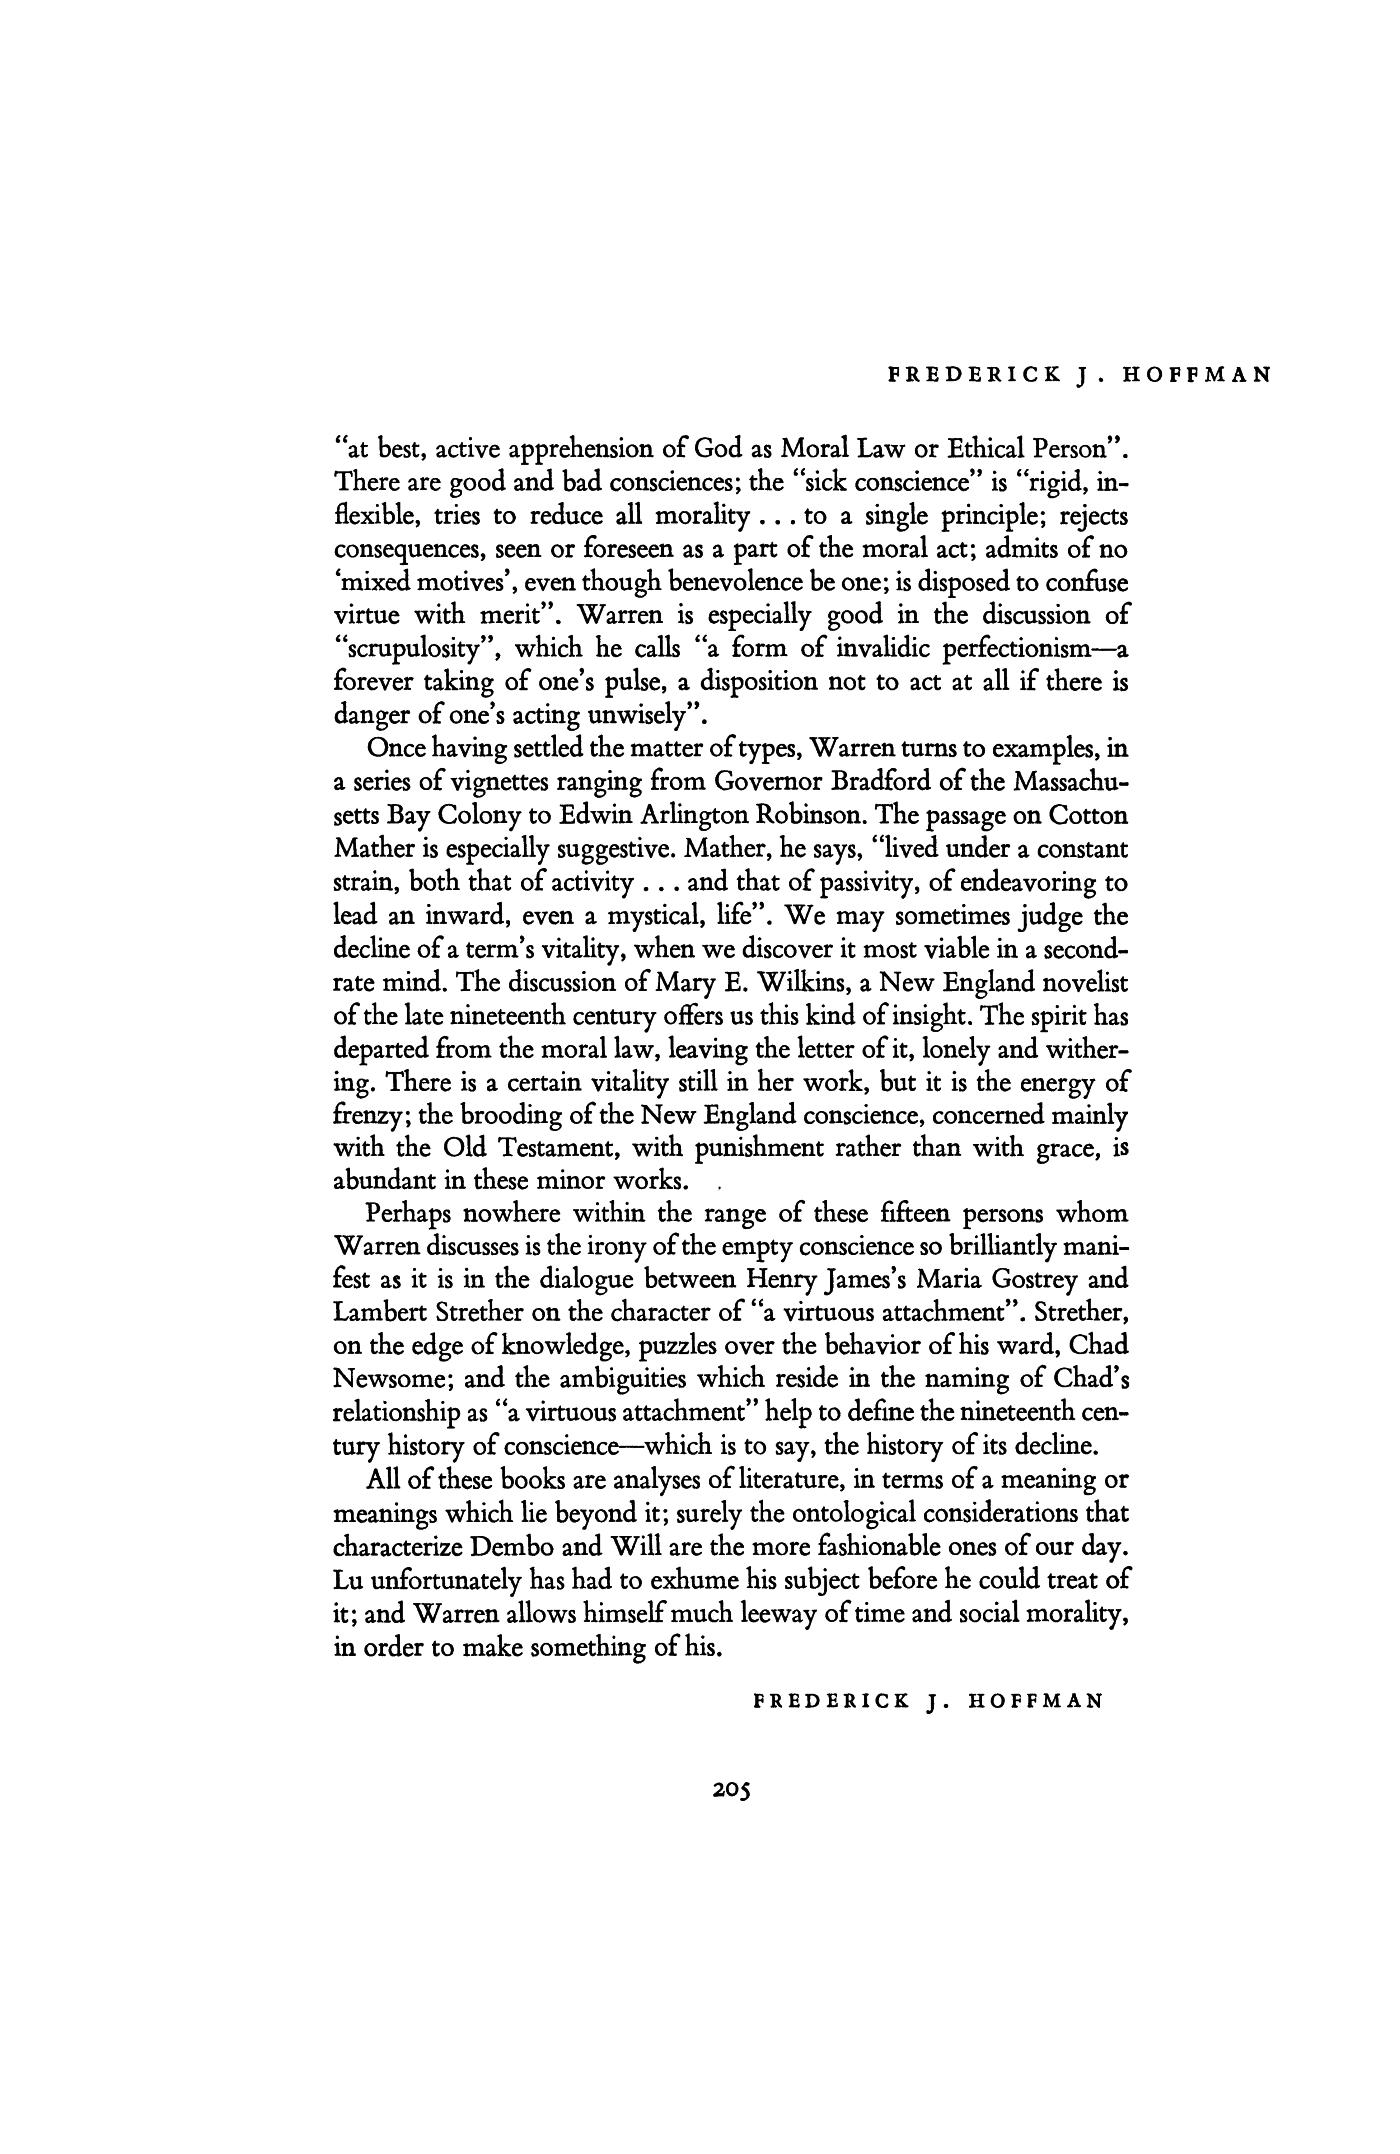 Essay romeo and juliet love